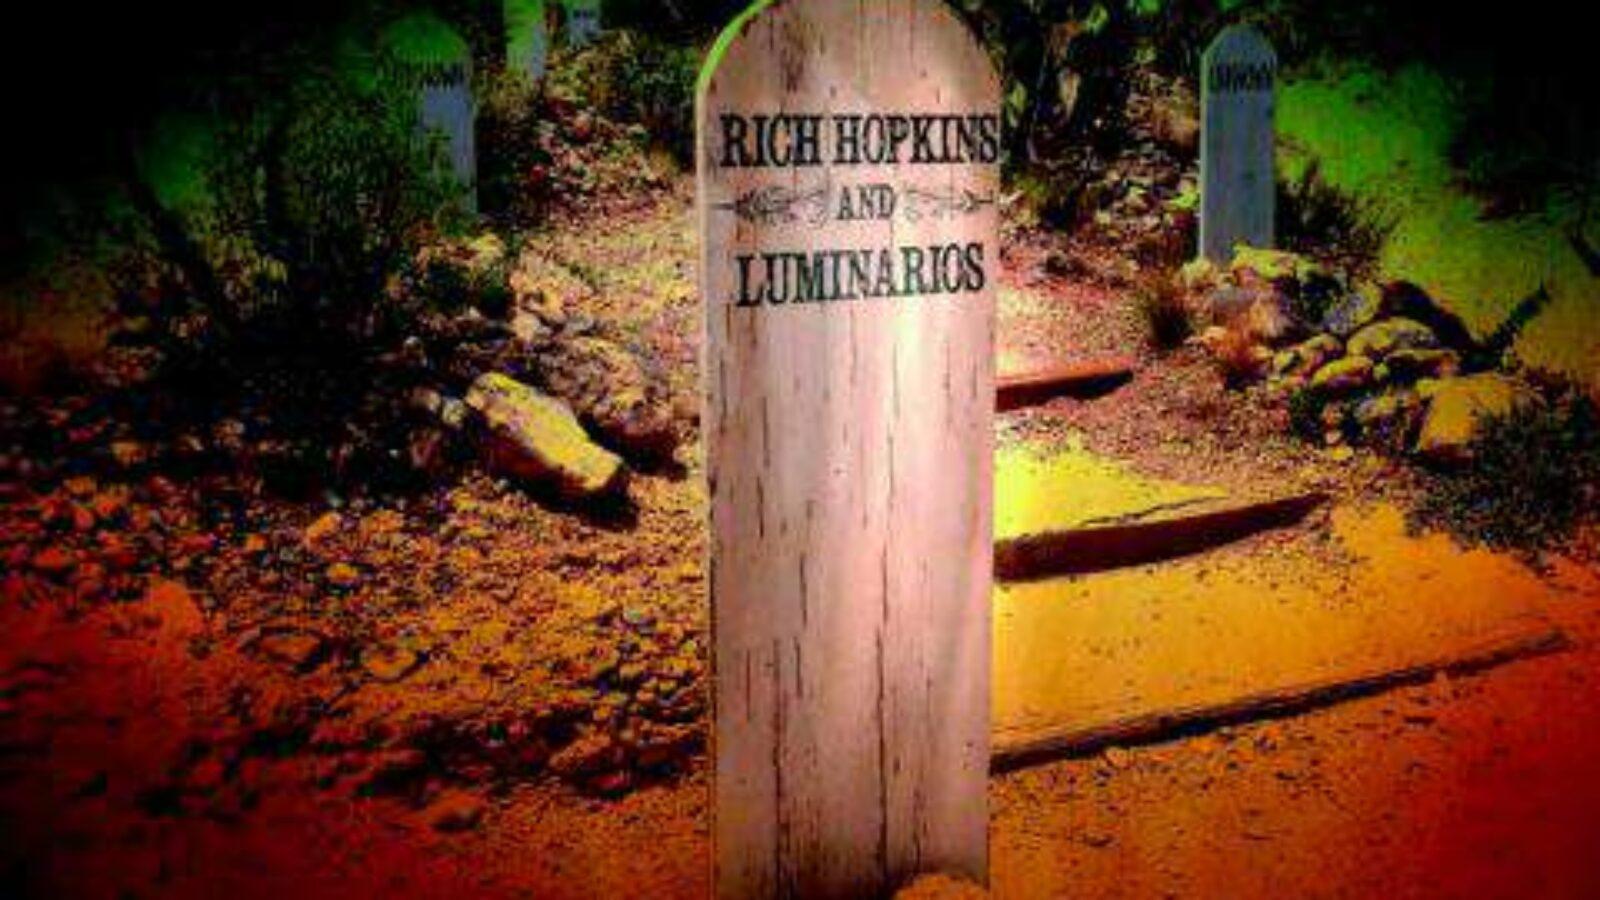 RICH HOPKINS & LUMINARIOS Tombstone